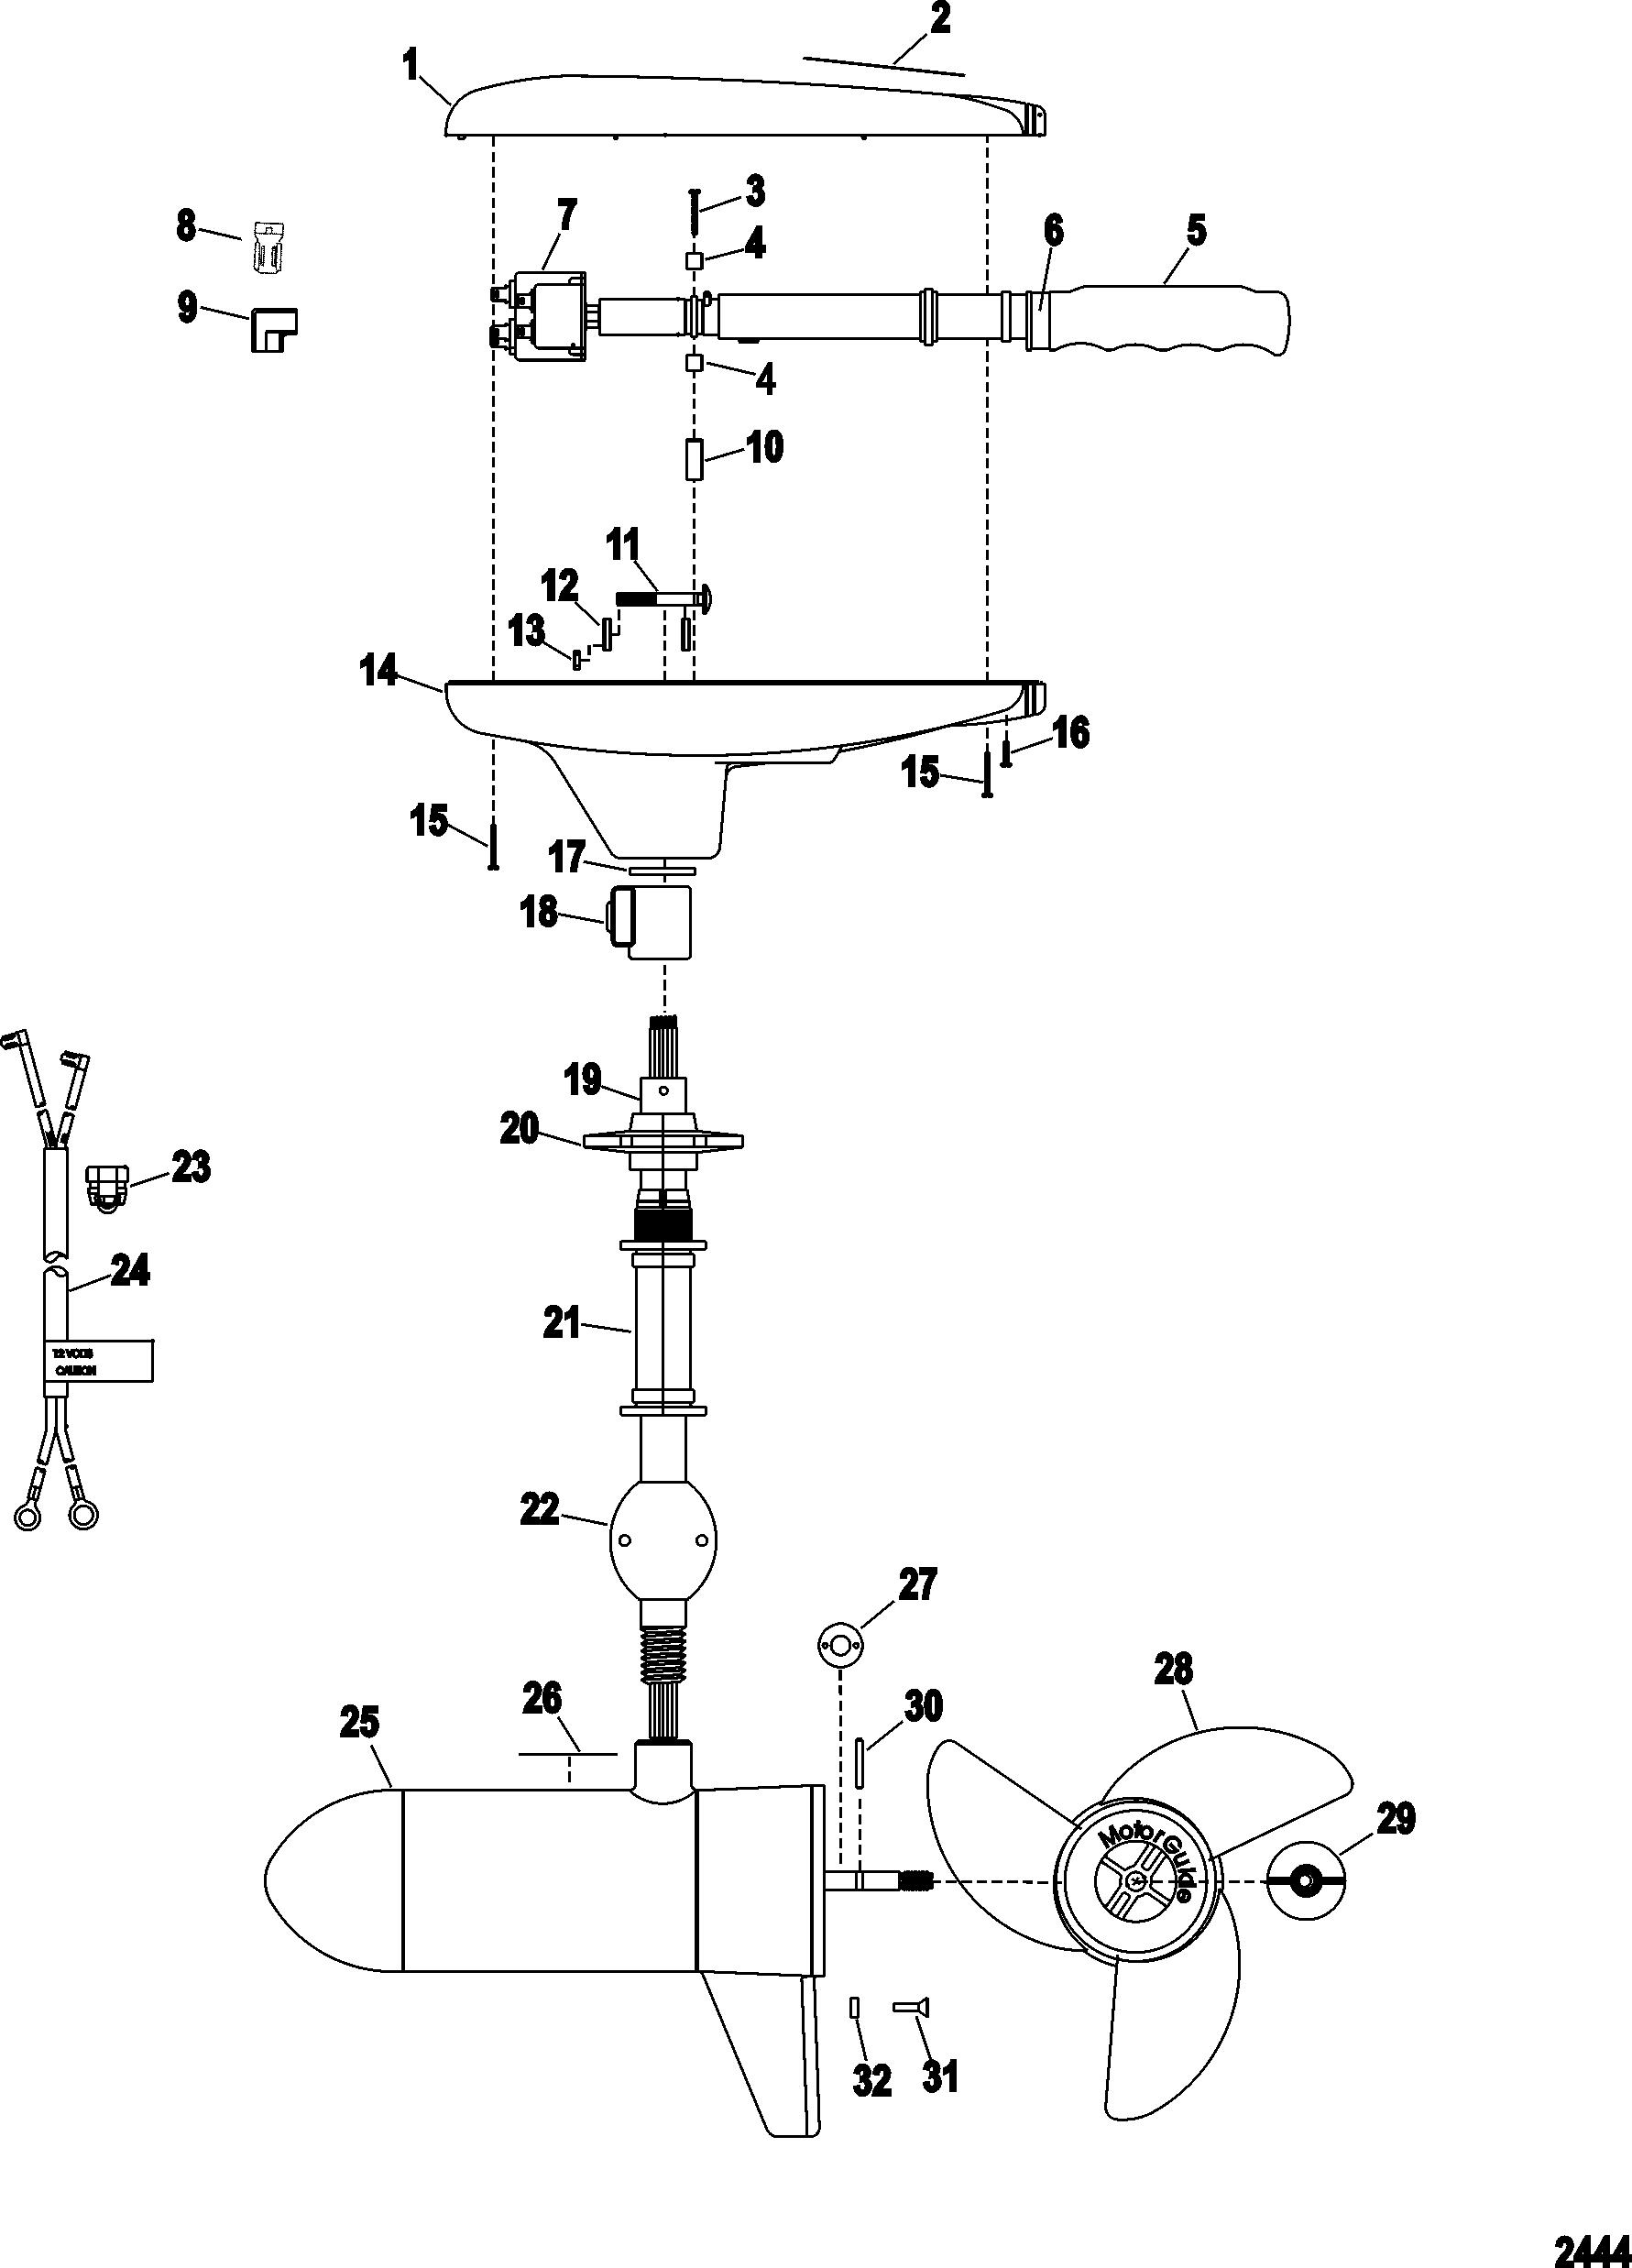 Complete Trolling Motor Model Gwb67w 24 Volt For